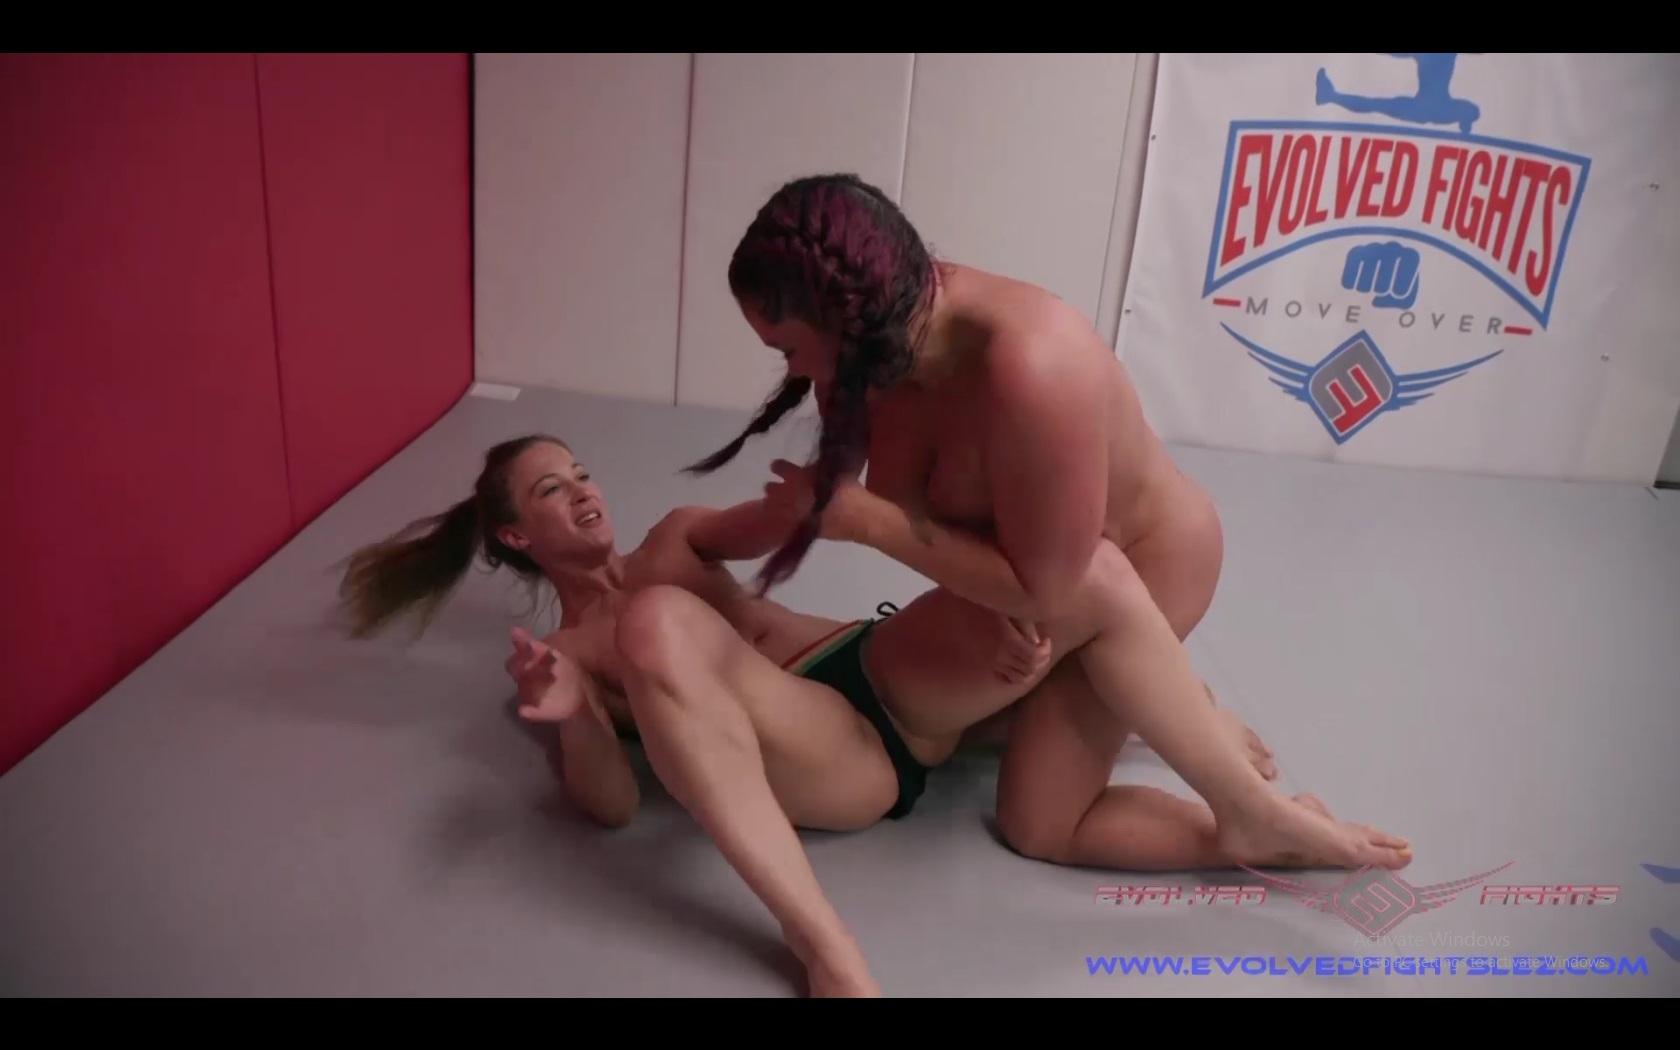 Cheyenne Jewel vs Jasmeen LeFleur Lesbian Wrestling Match at Evolved Fights